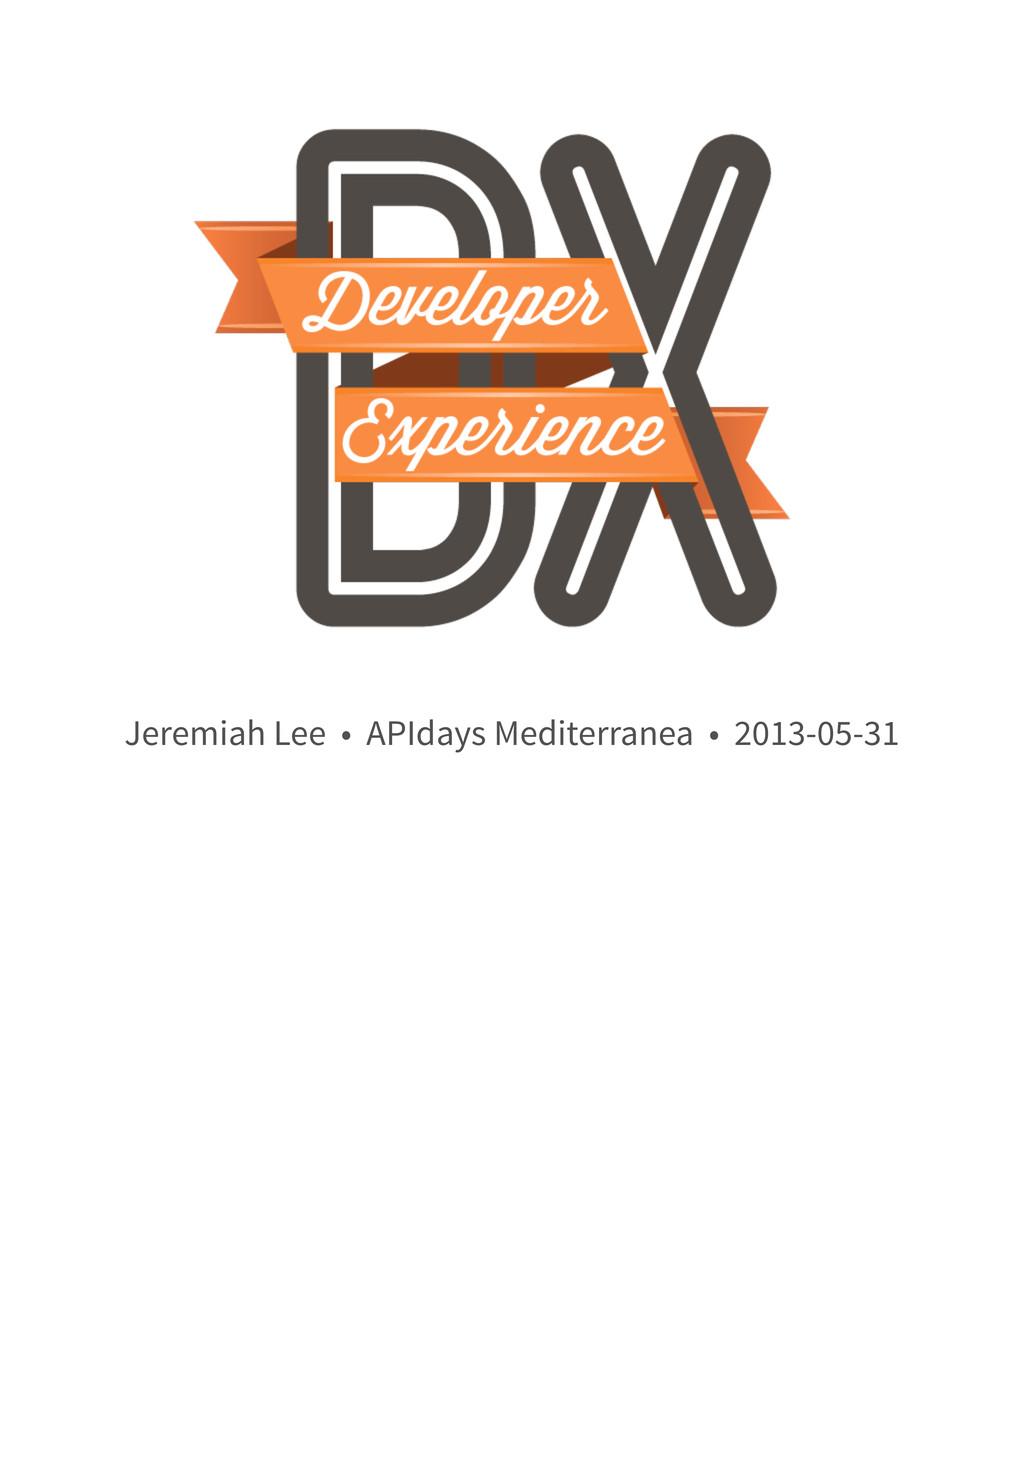 Jeremiah Lee • APIdays Mediterranea • 2013-05-31